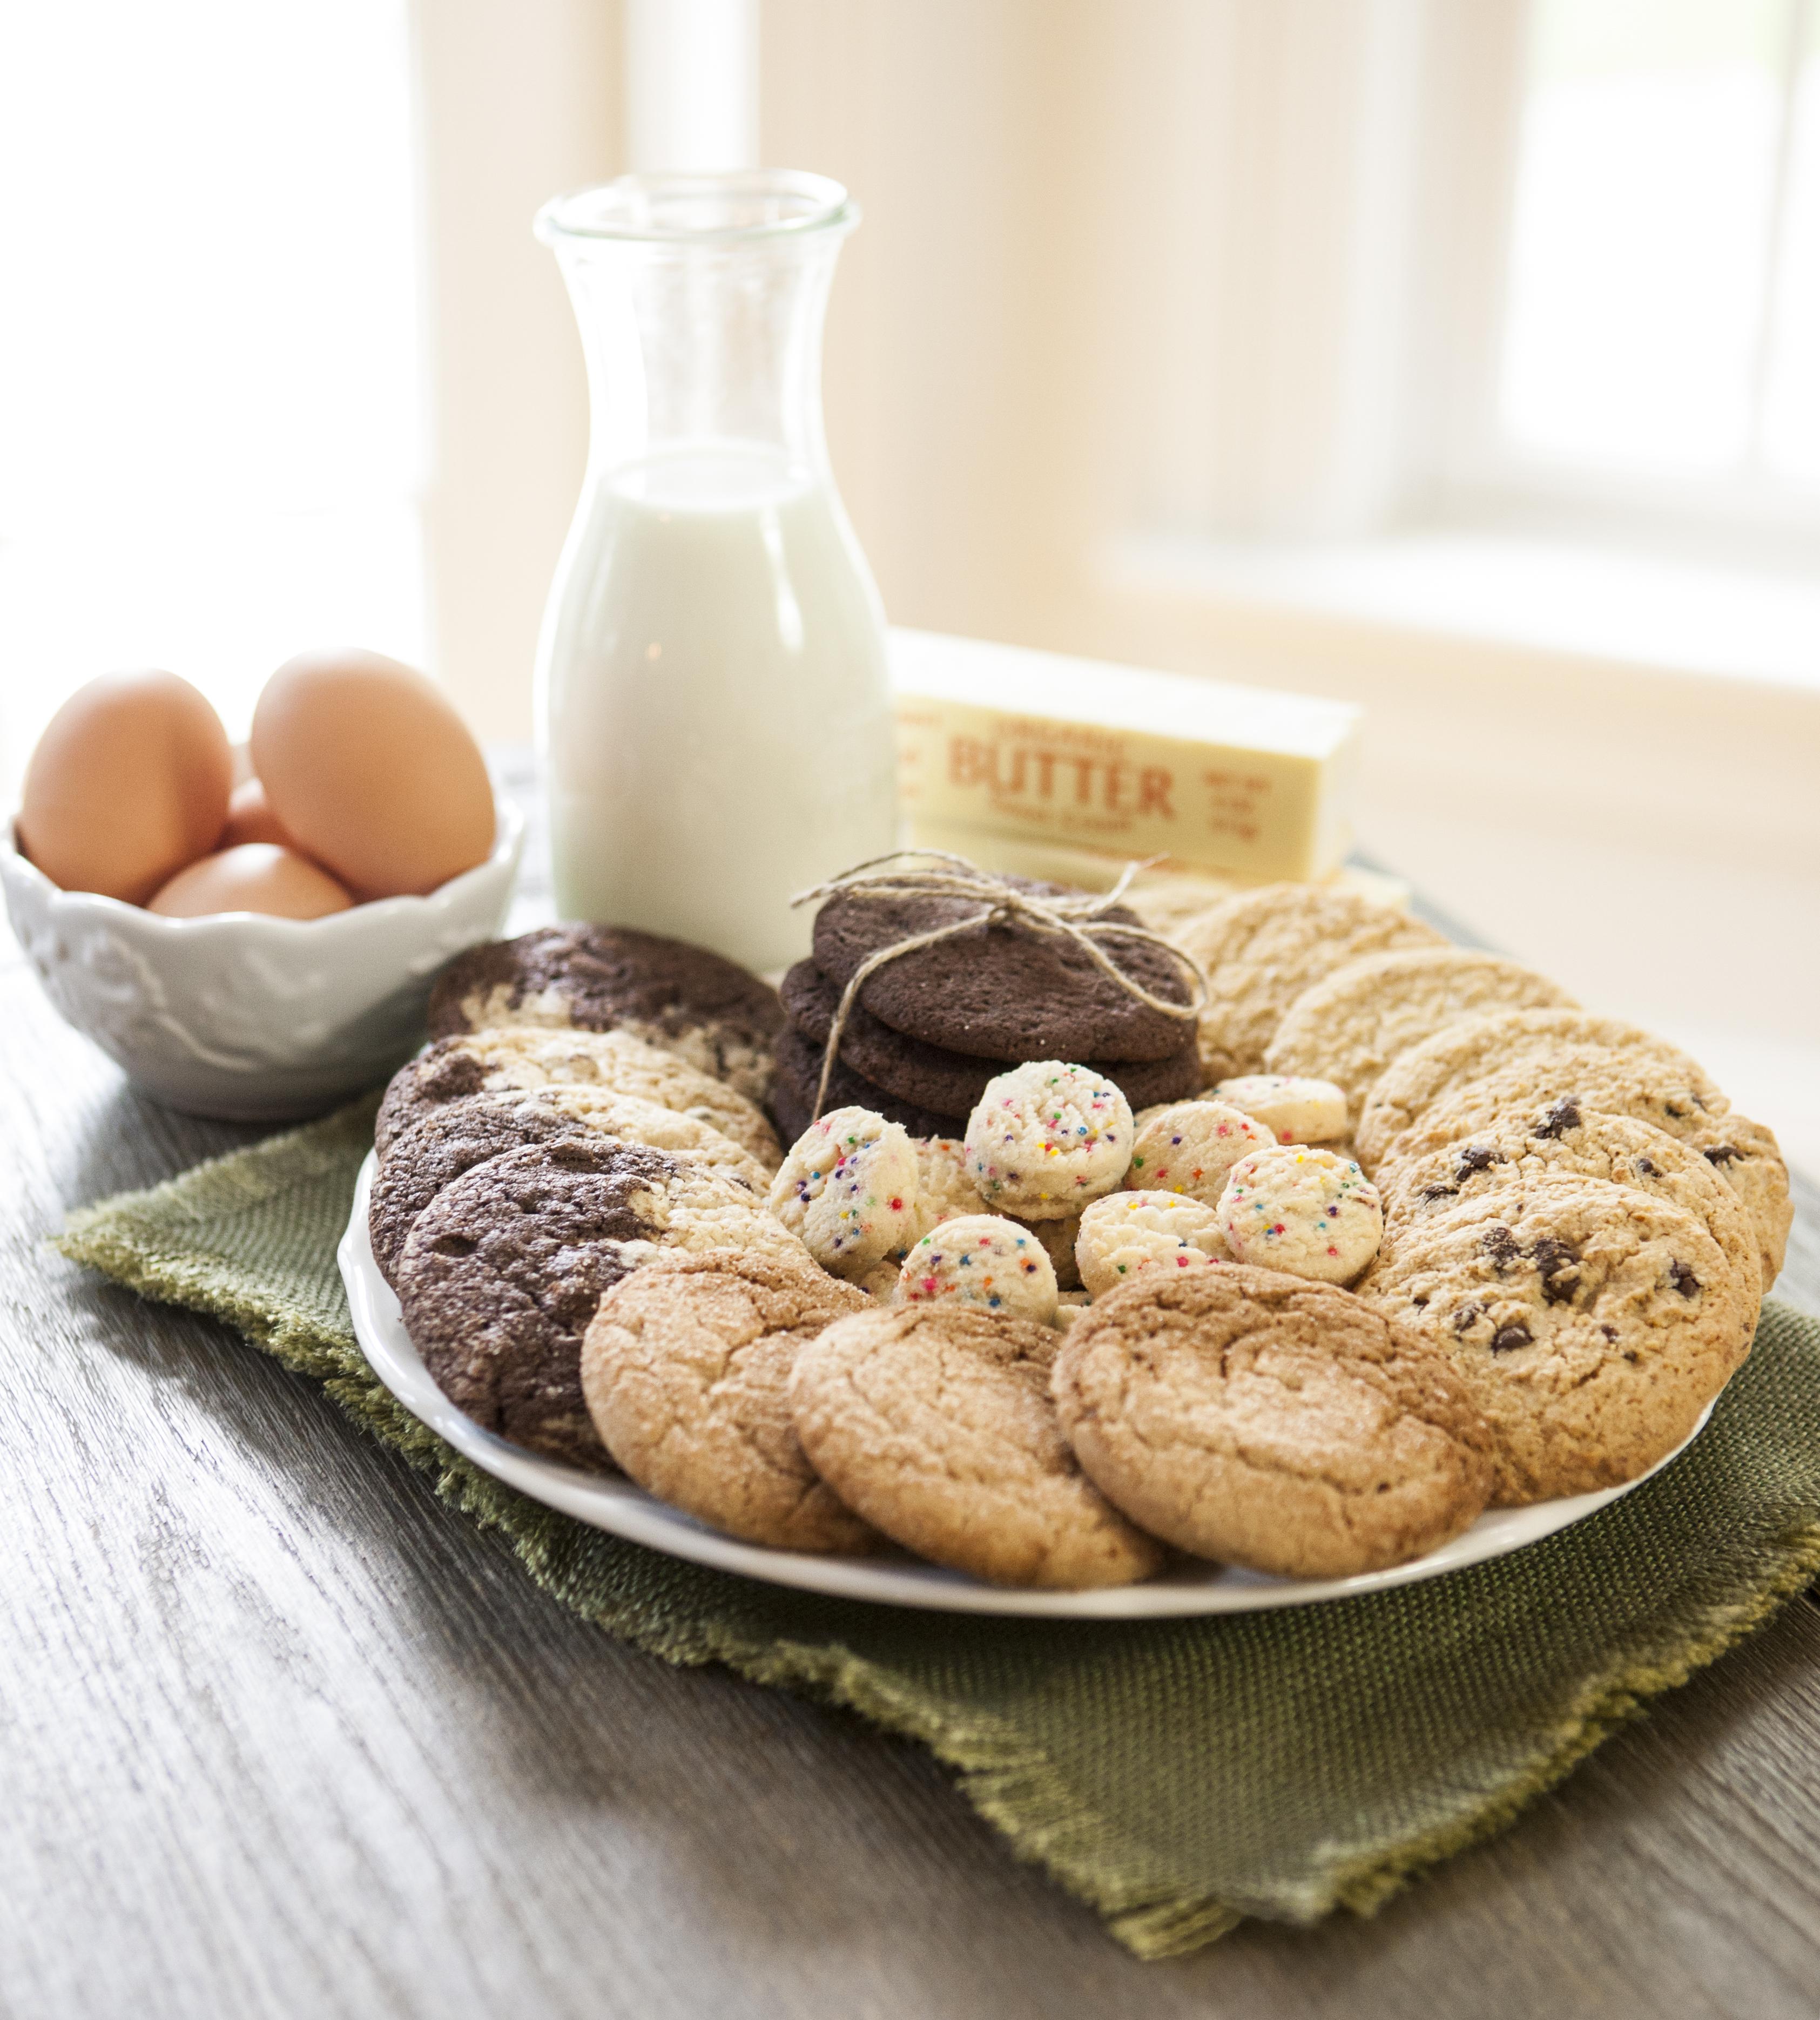 Virtual Camp Snackery- week 6 ( 2 hours Tues through Fri) Aug 4-7 - Cookie, Cookies and more Cookies!